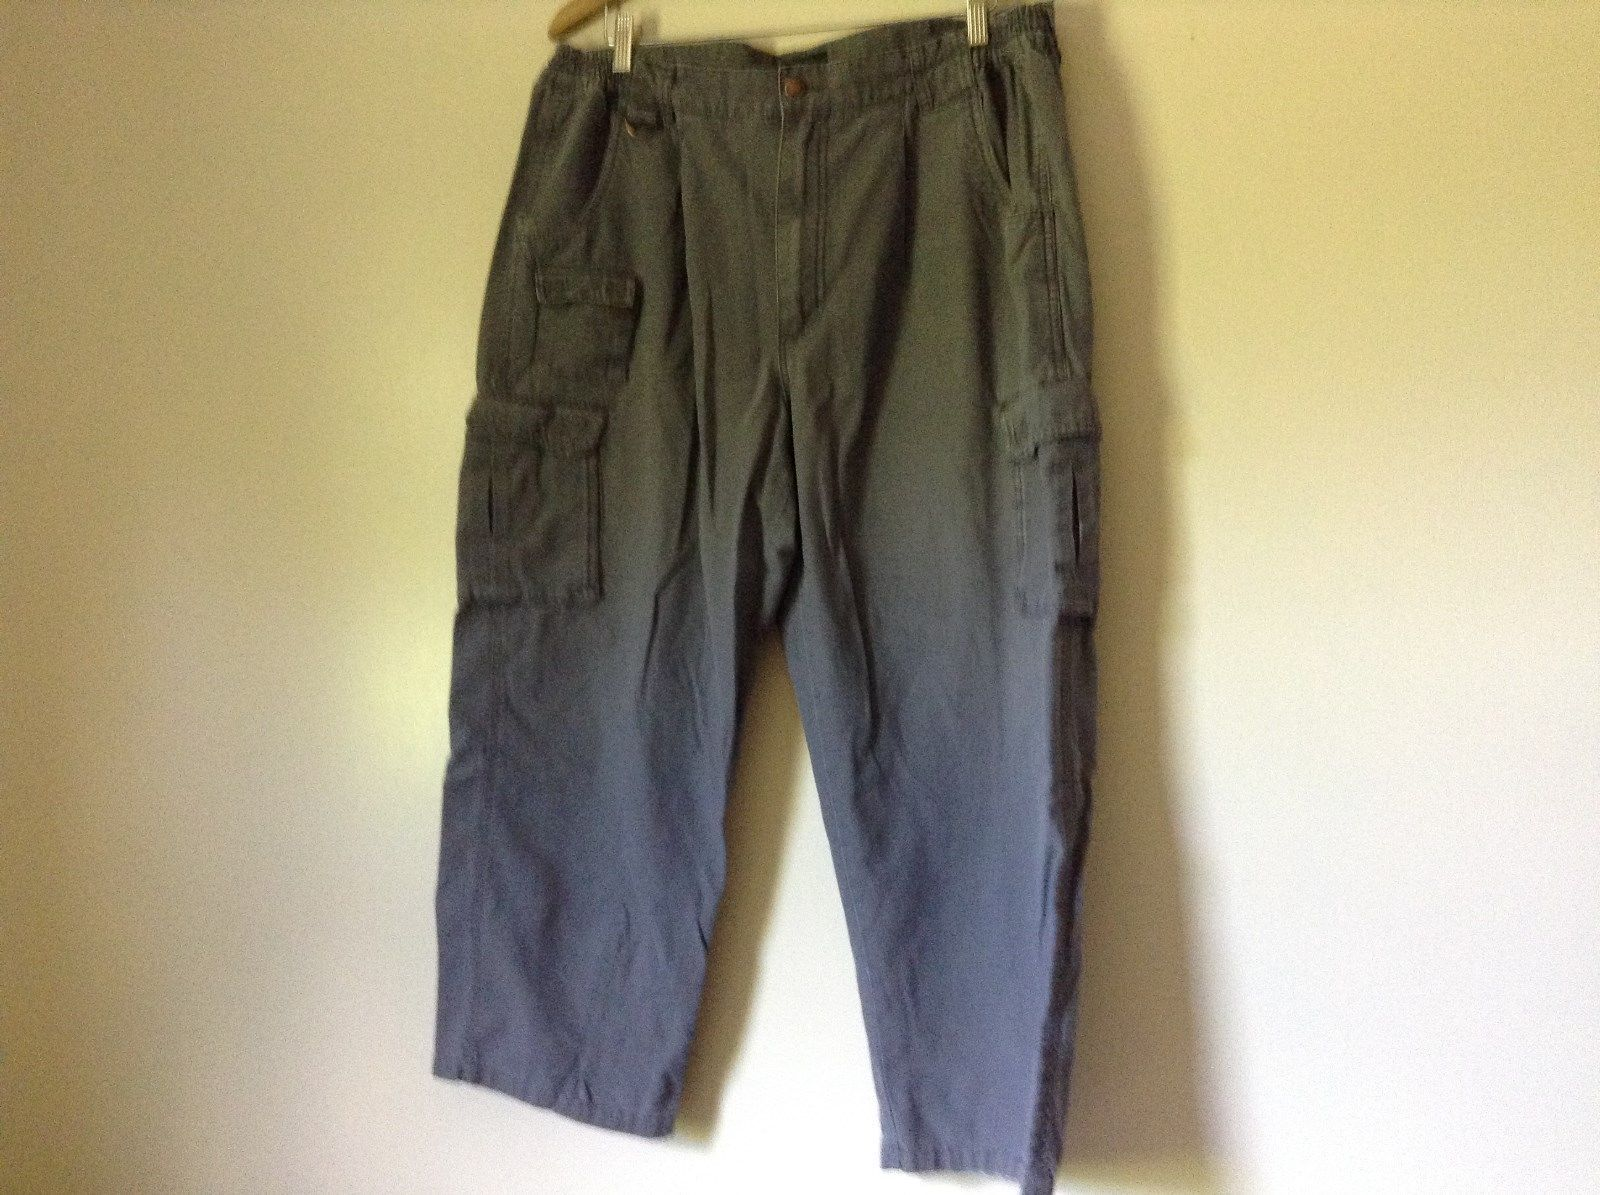 Scandia Woods Gray Cargo Pants 100 Percent Cotton Stretchy Waist